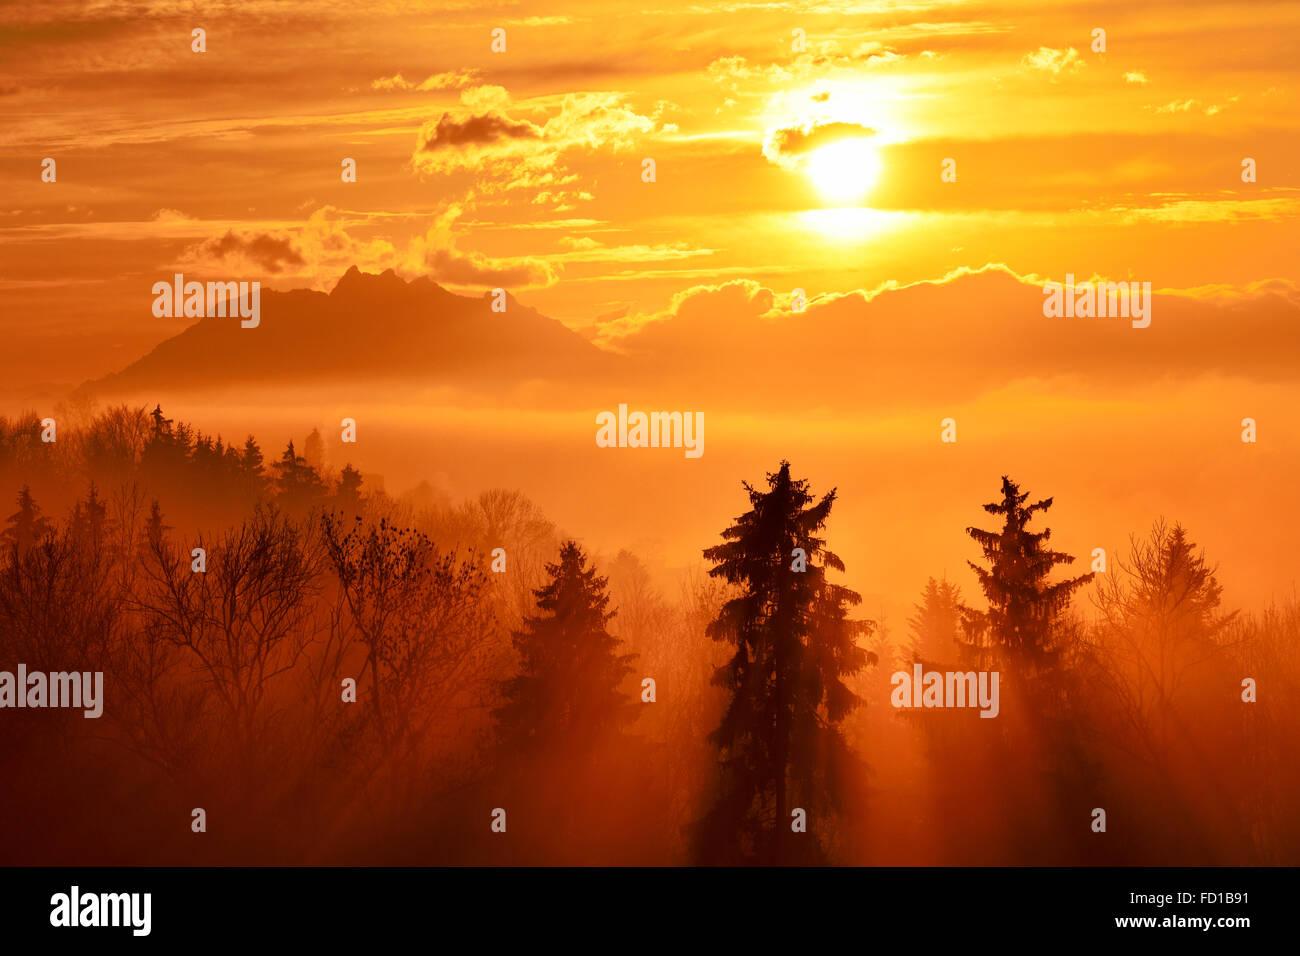 Sun rays shining through foggy spruce forest, Pilatus behind, Baar, Canton of Zug, Switzerland - Stock Image